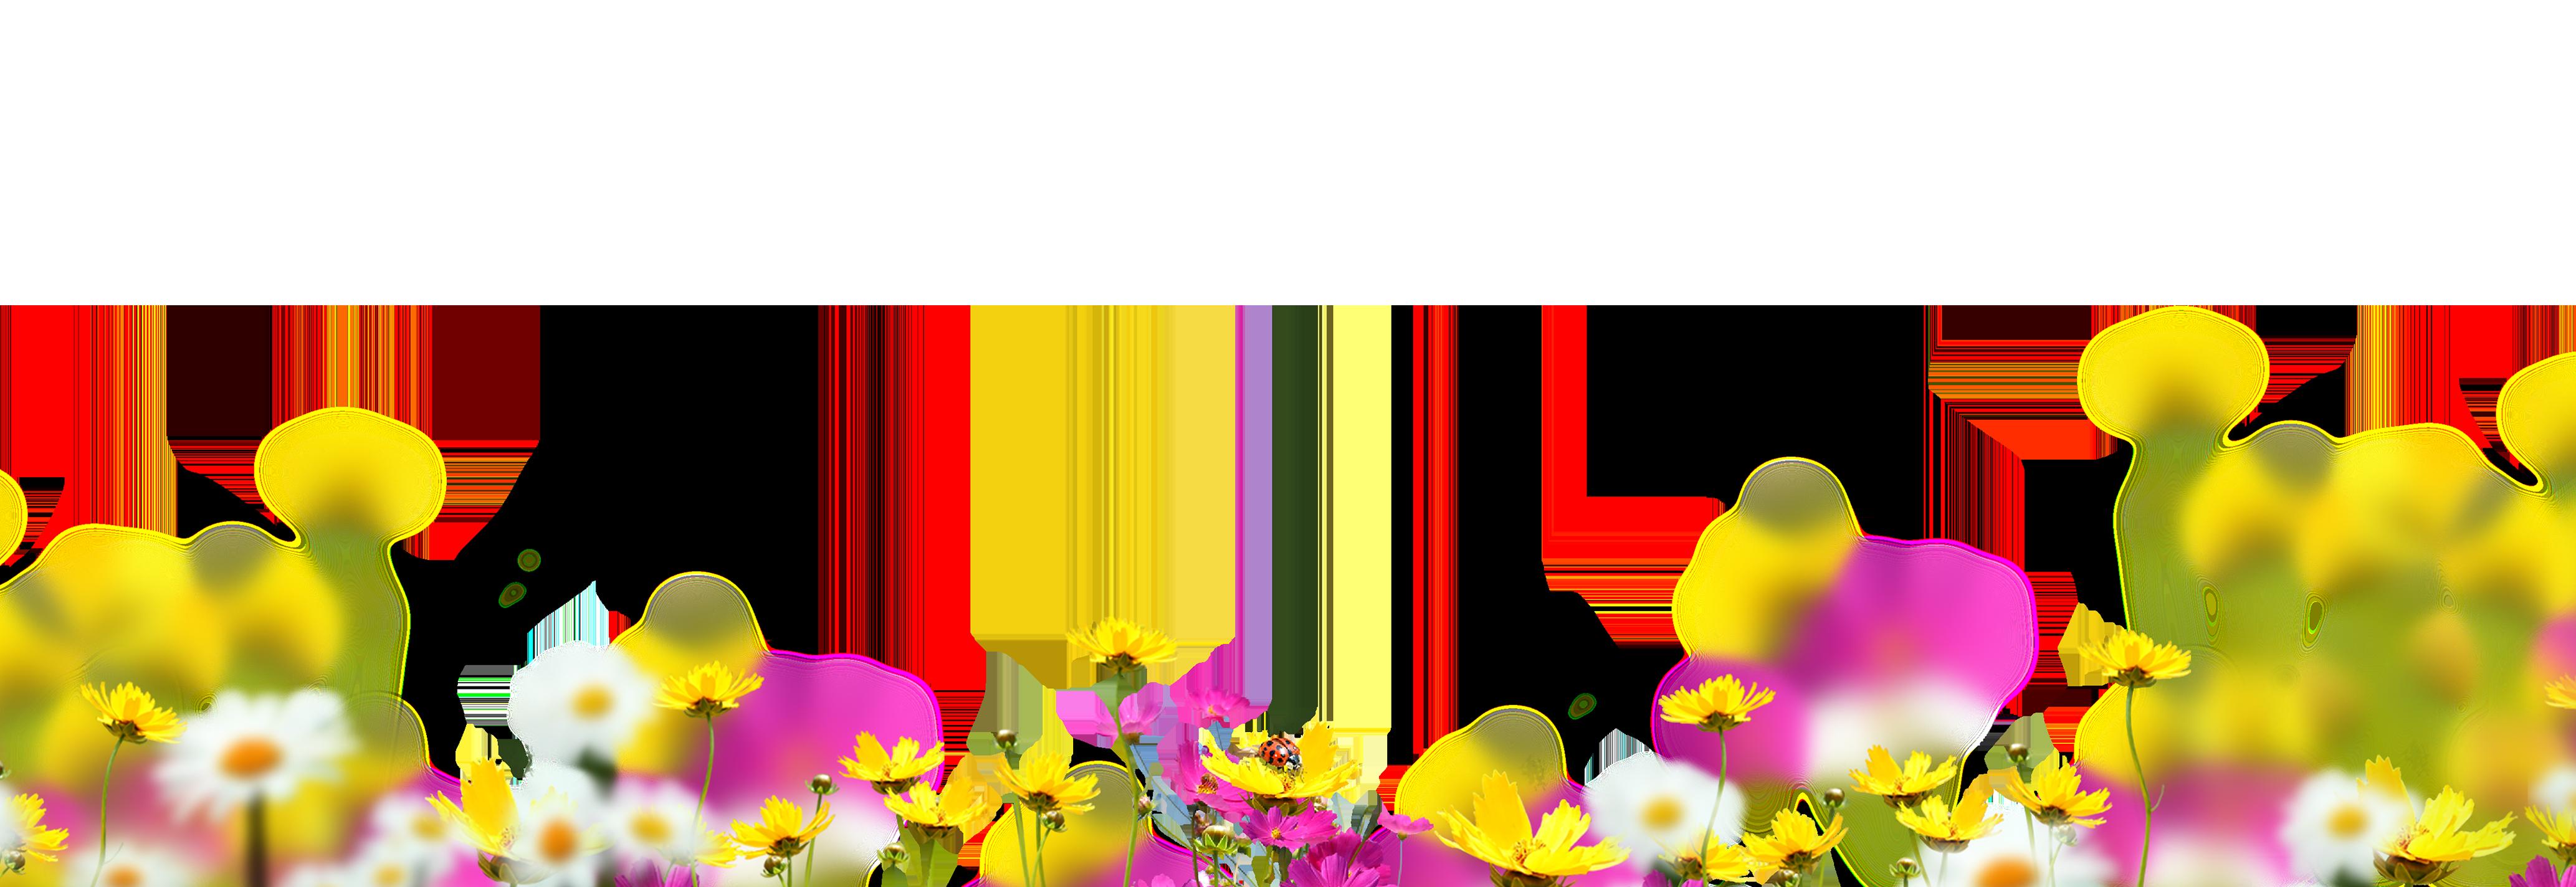 FREE flower overlay, Photoshop overlays